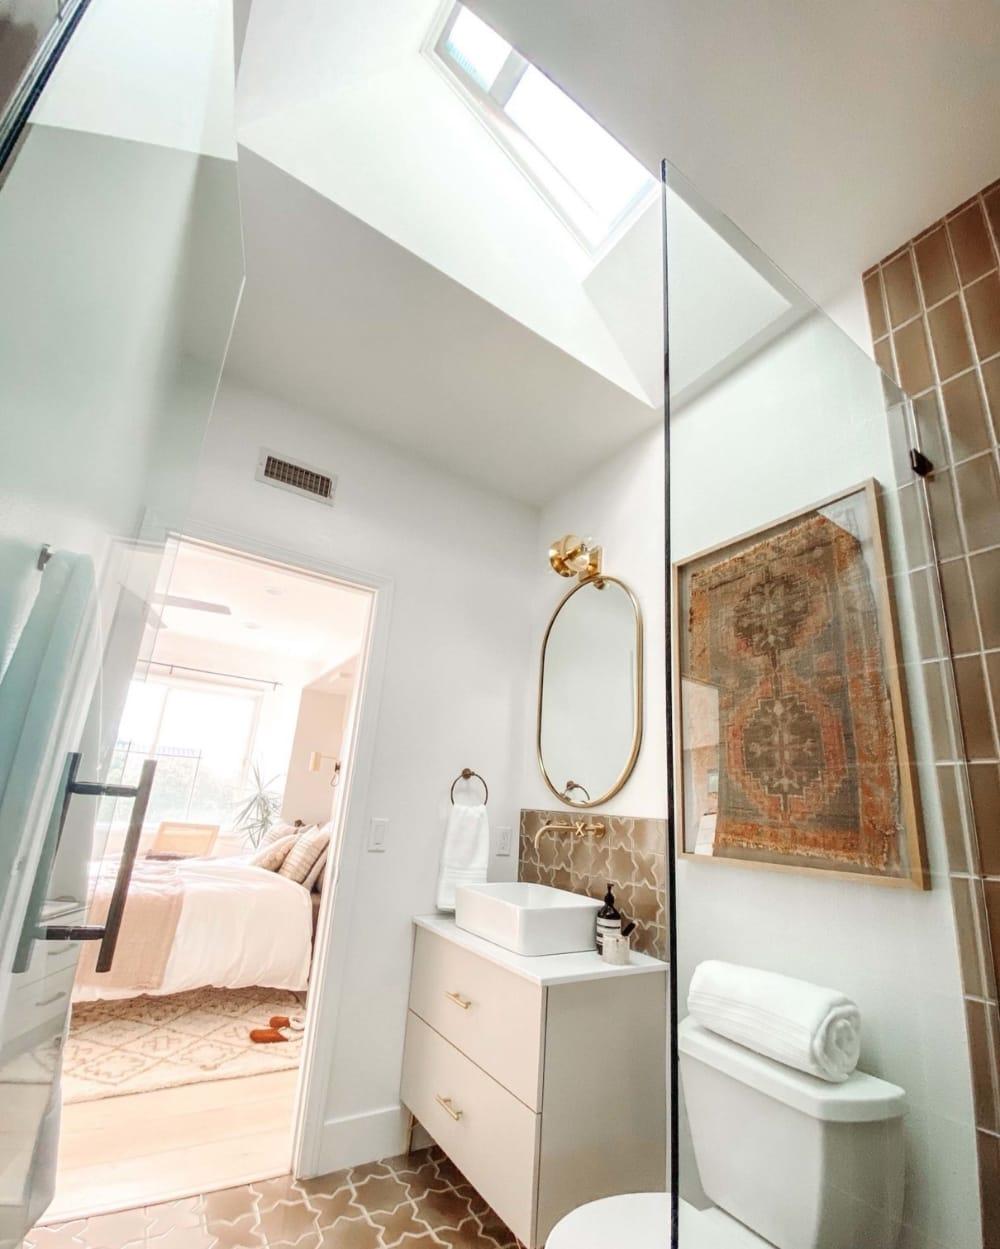 small bathroom with a skylight tan tile and a bras frame mirror